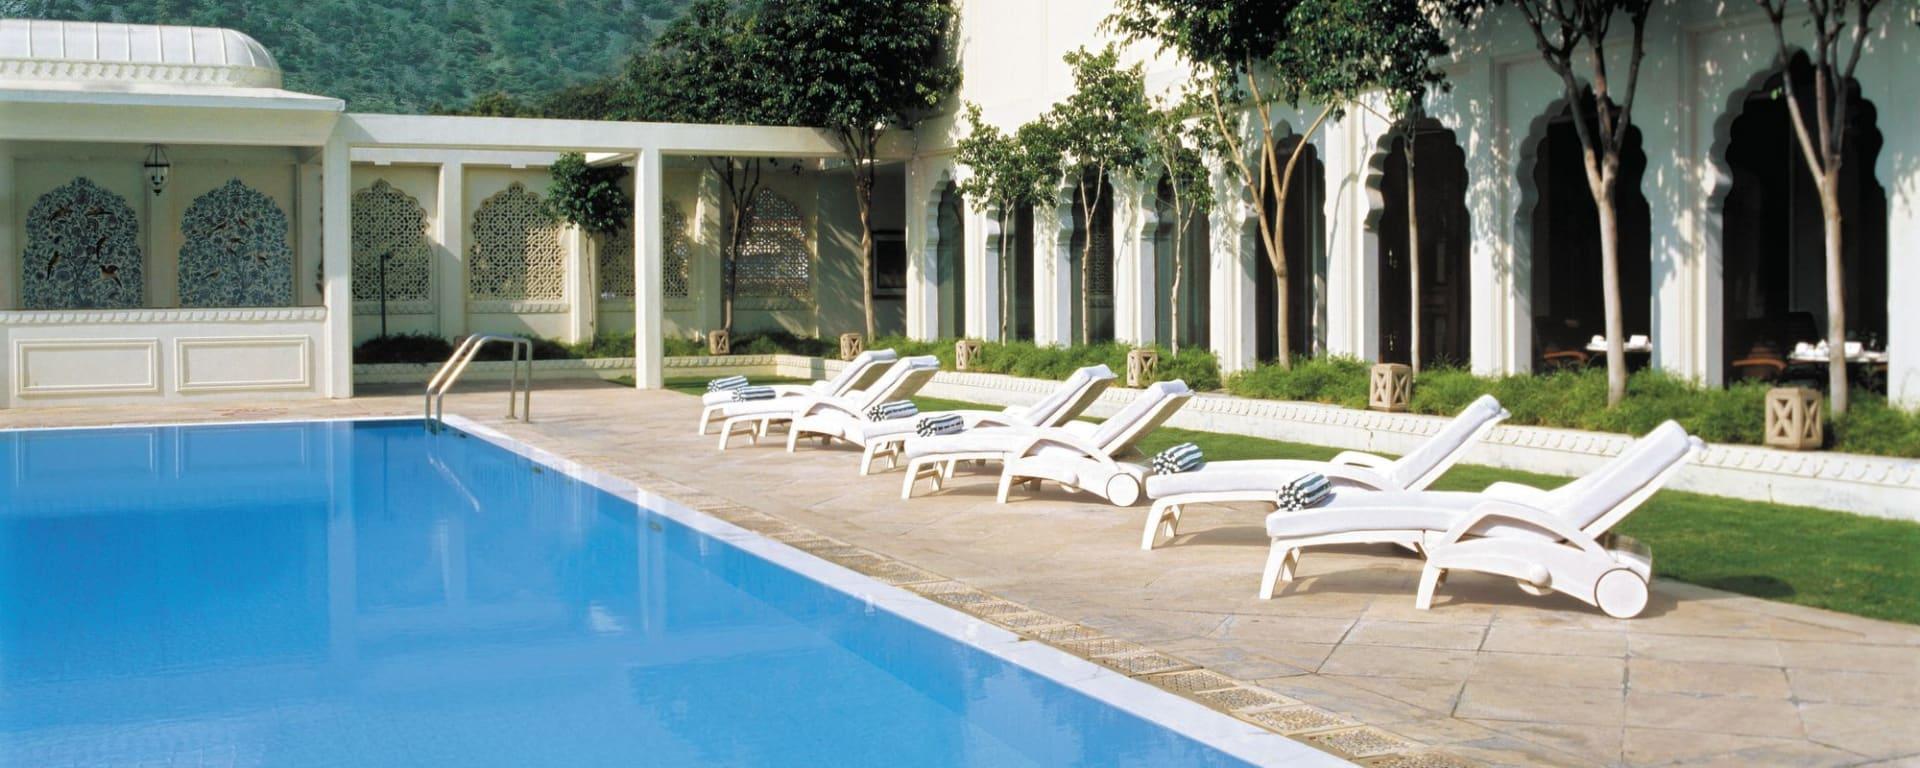 Trident à Jaipur: Pool